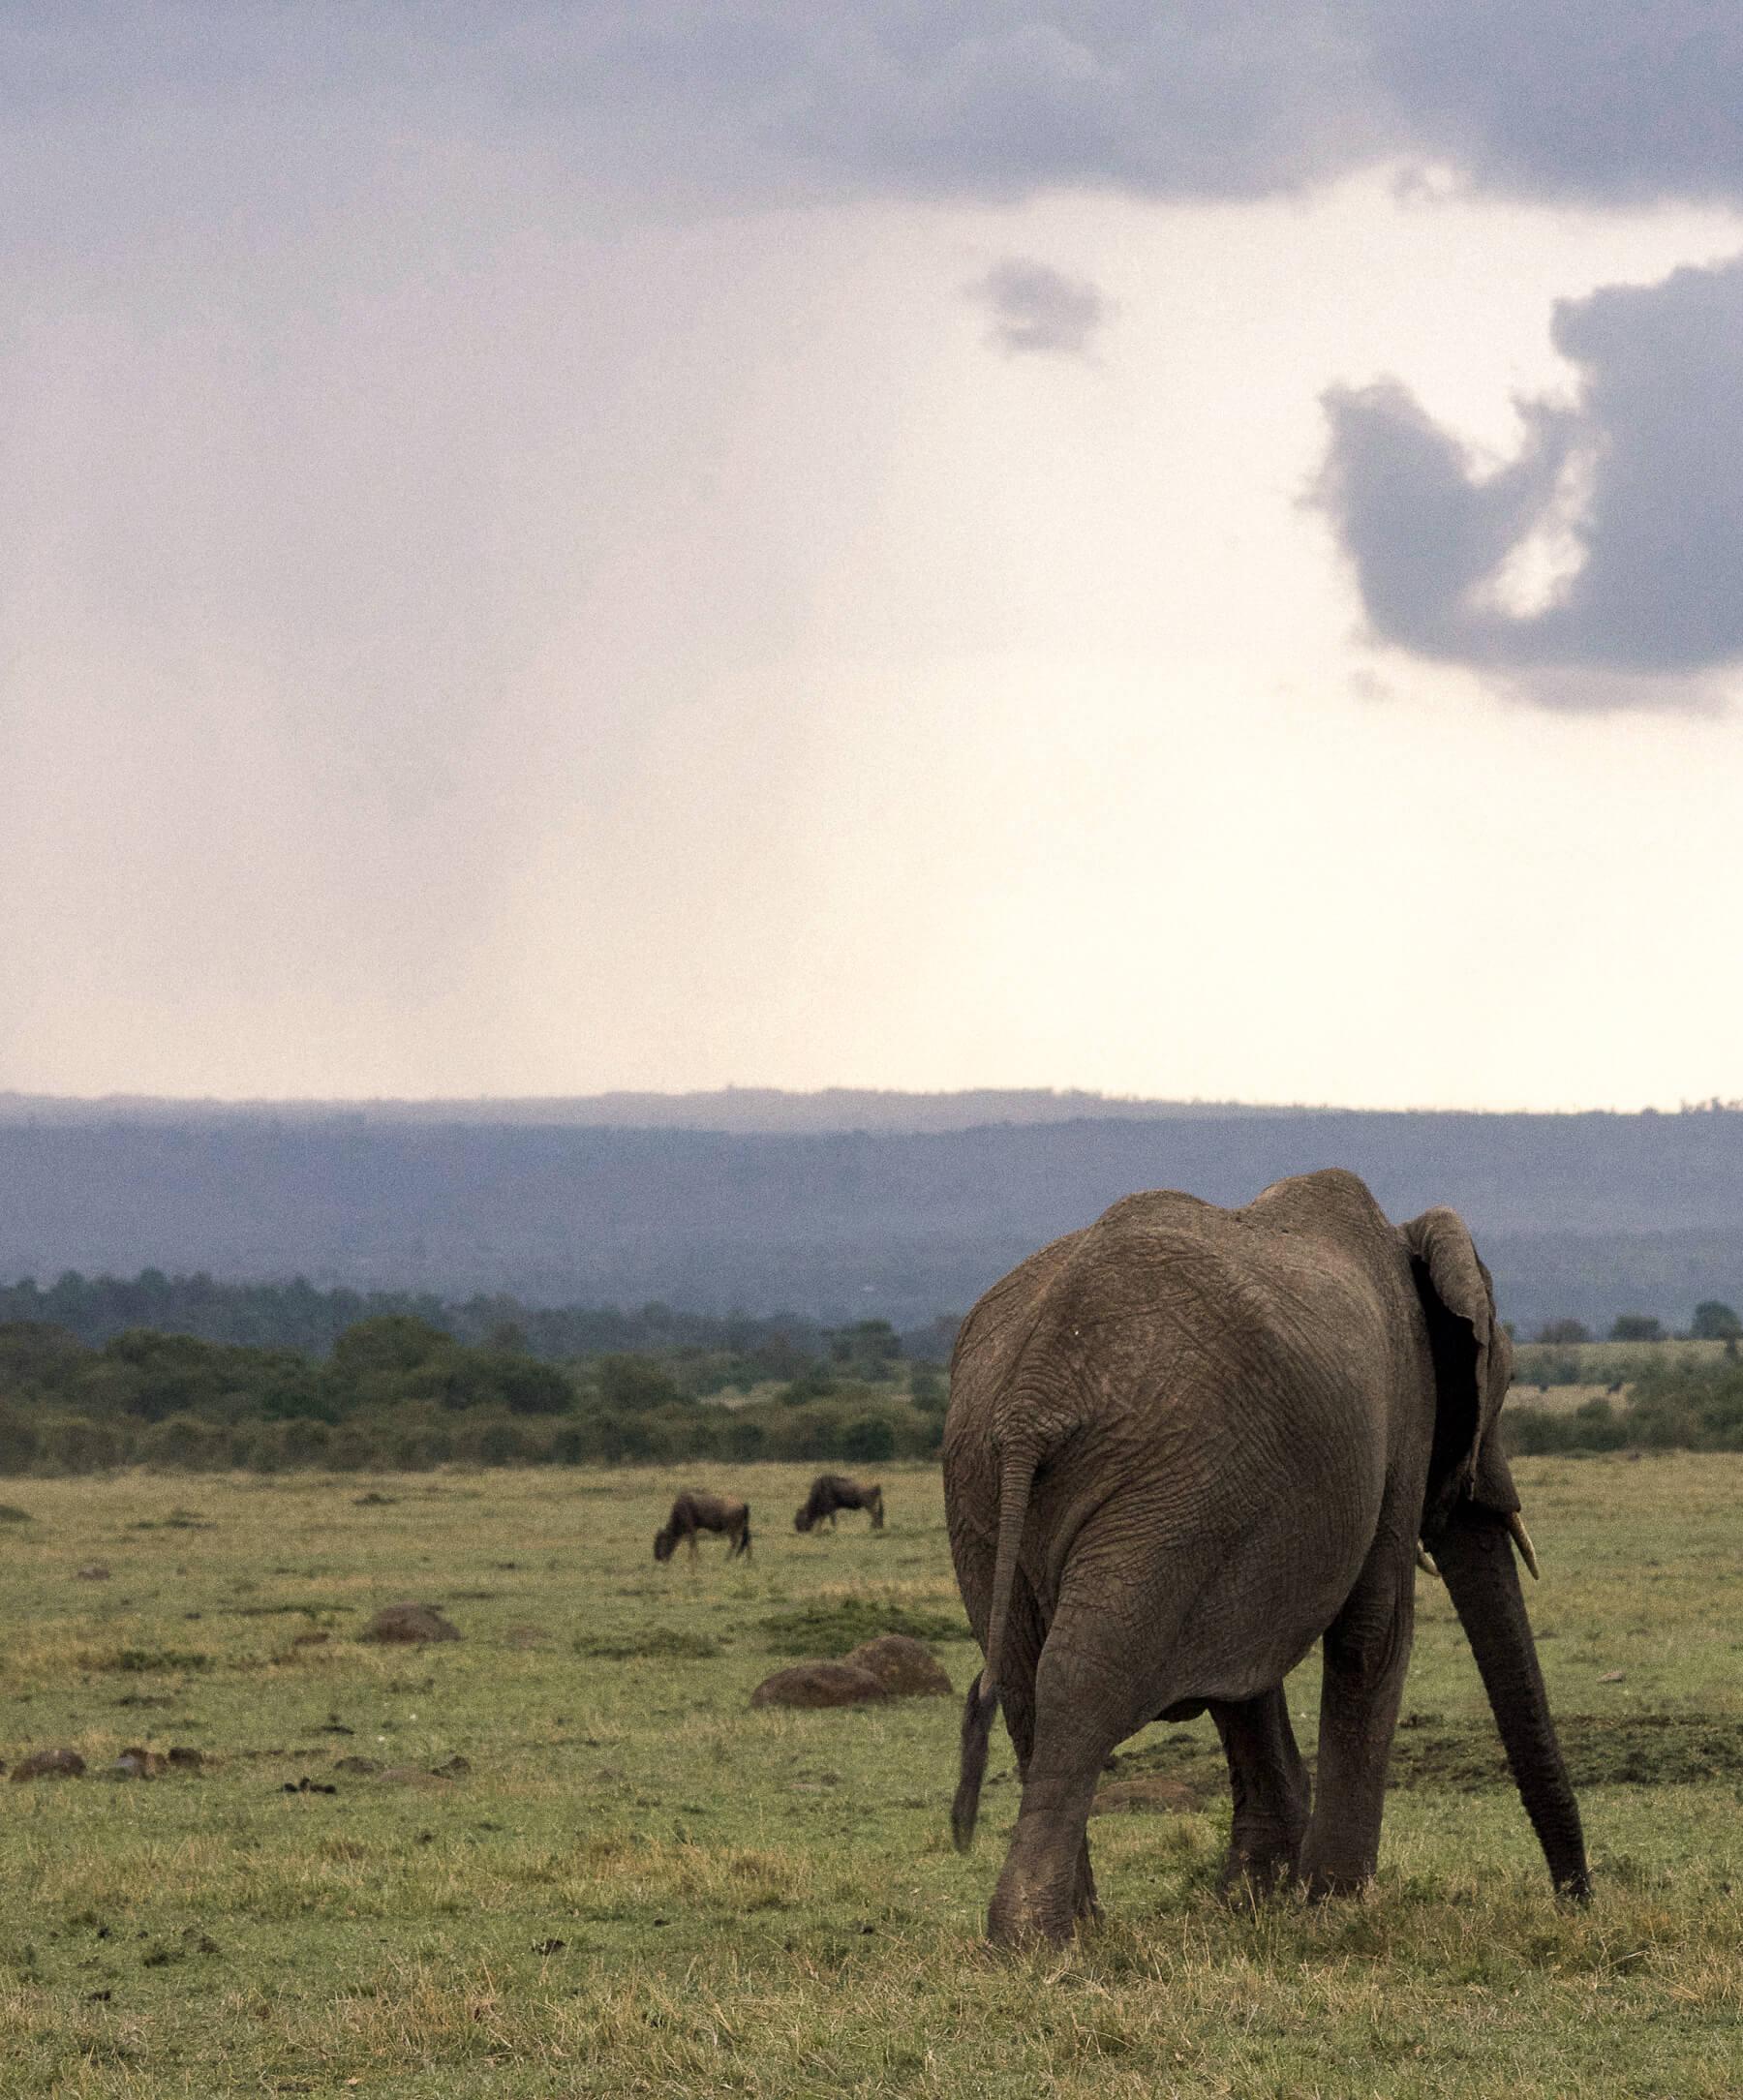 An elephant walking away from the camera towards a huge rain cloud